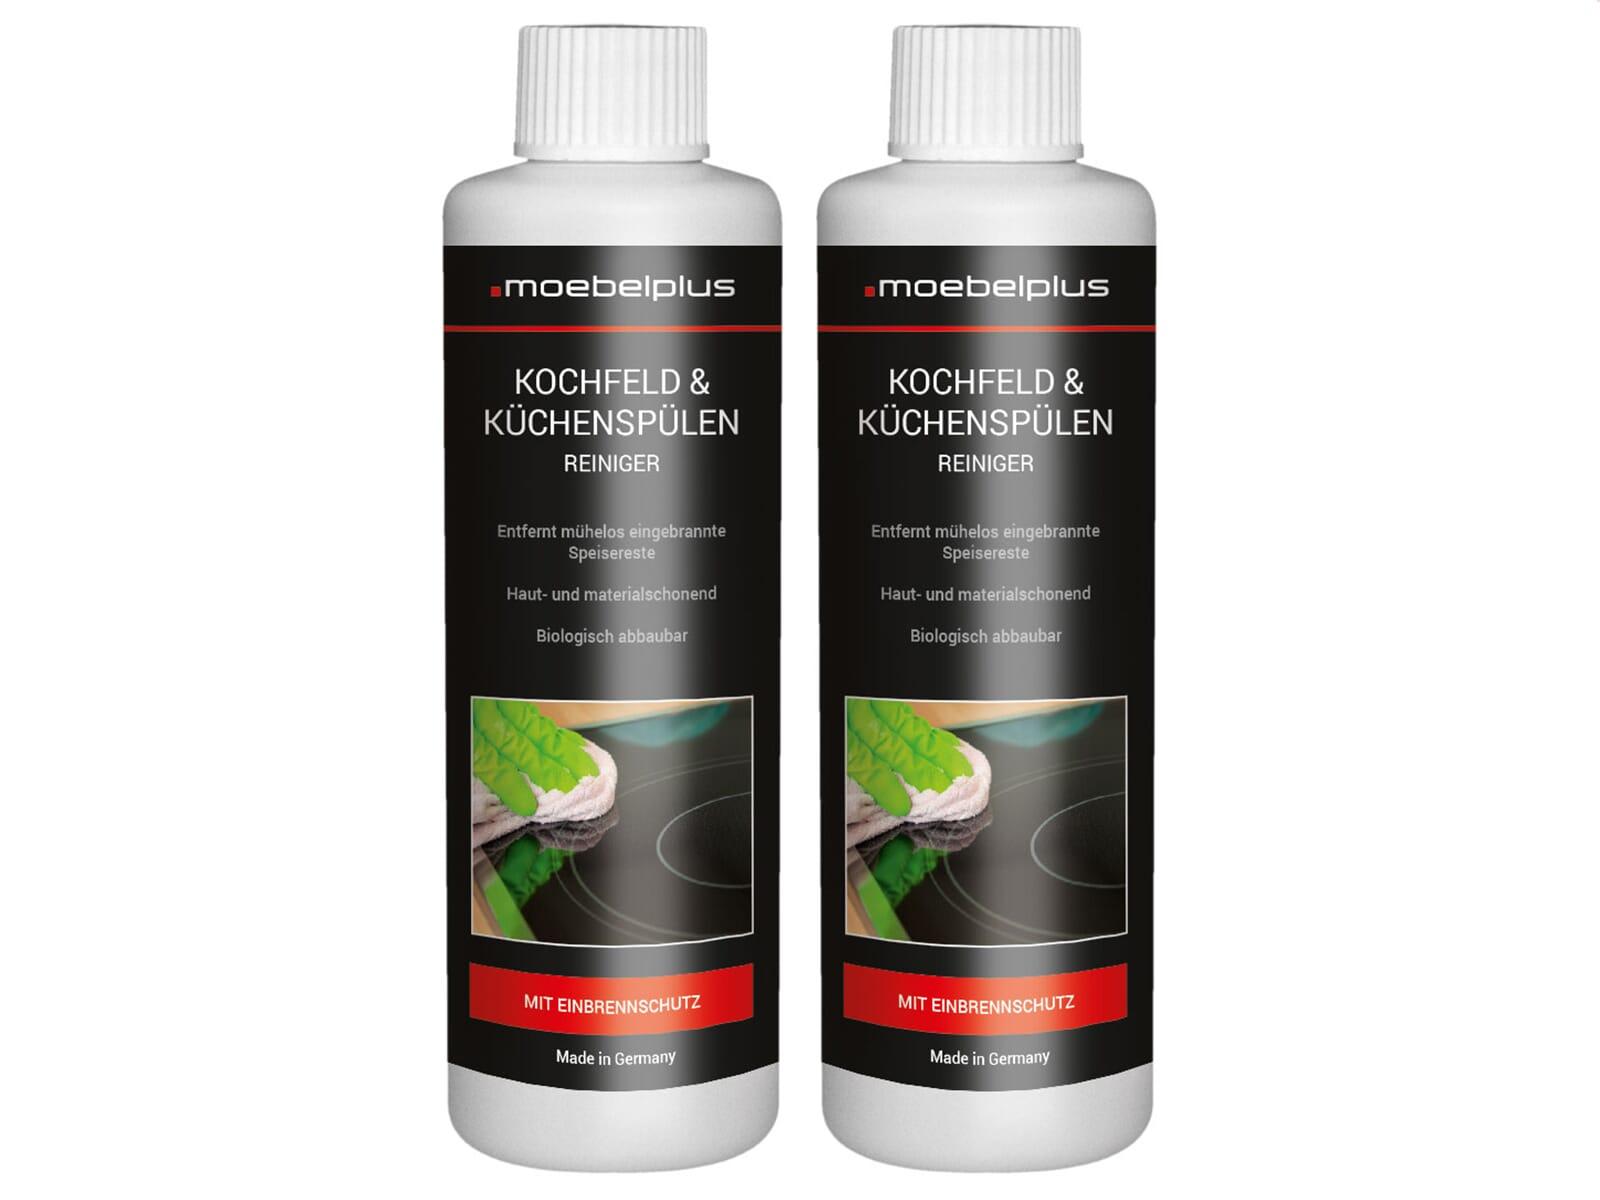 moebelplus Kochfeld & Küchenspülen Reiniger - 2er Set